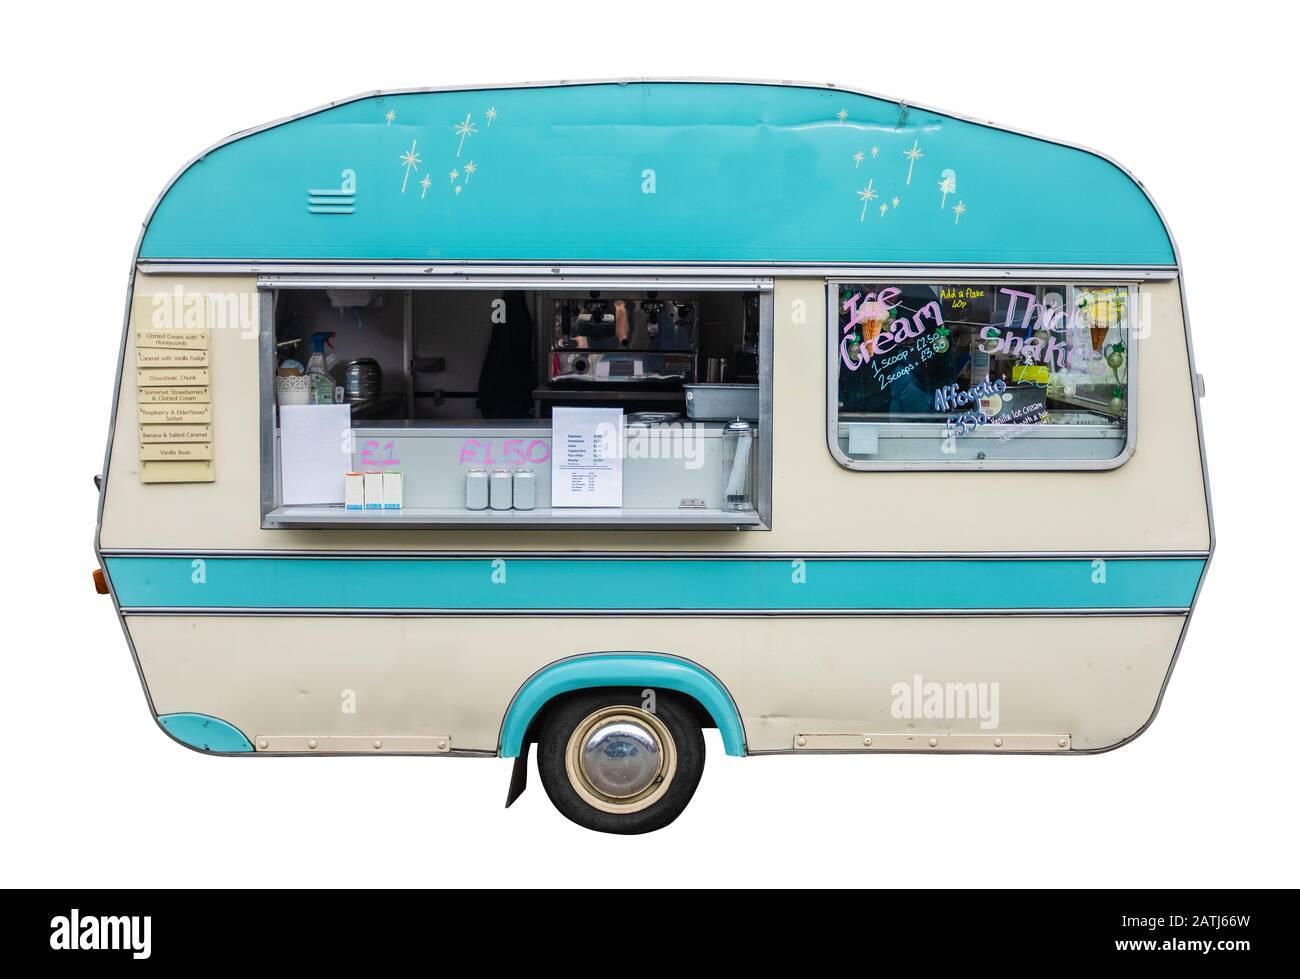 Retro Vintage Food Truck (Caravan) For Coffee Ice Cream And Snacks Stock Photo